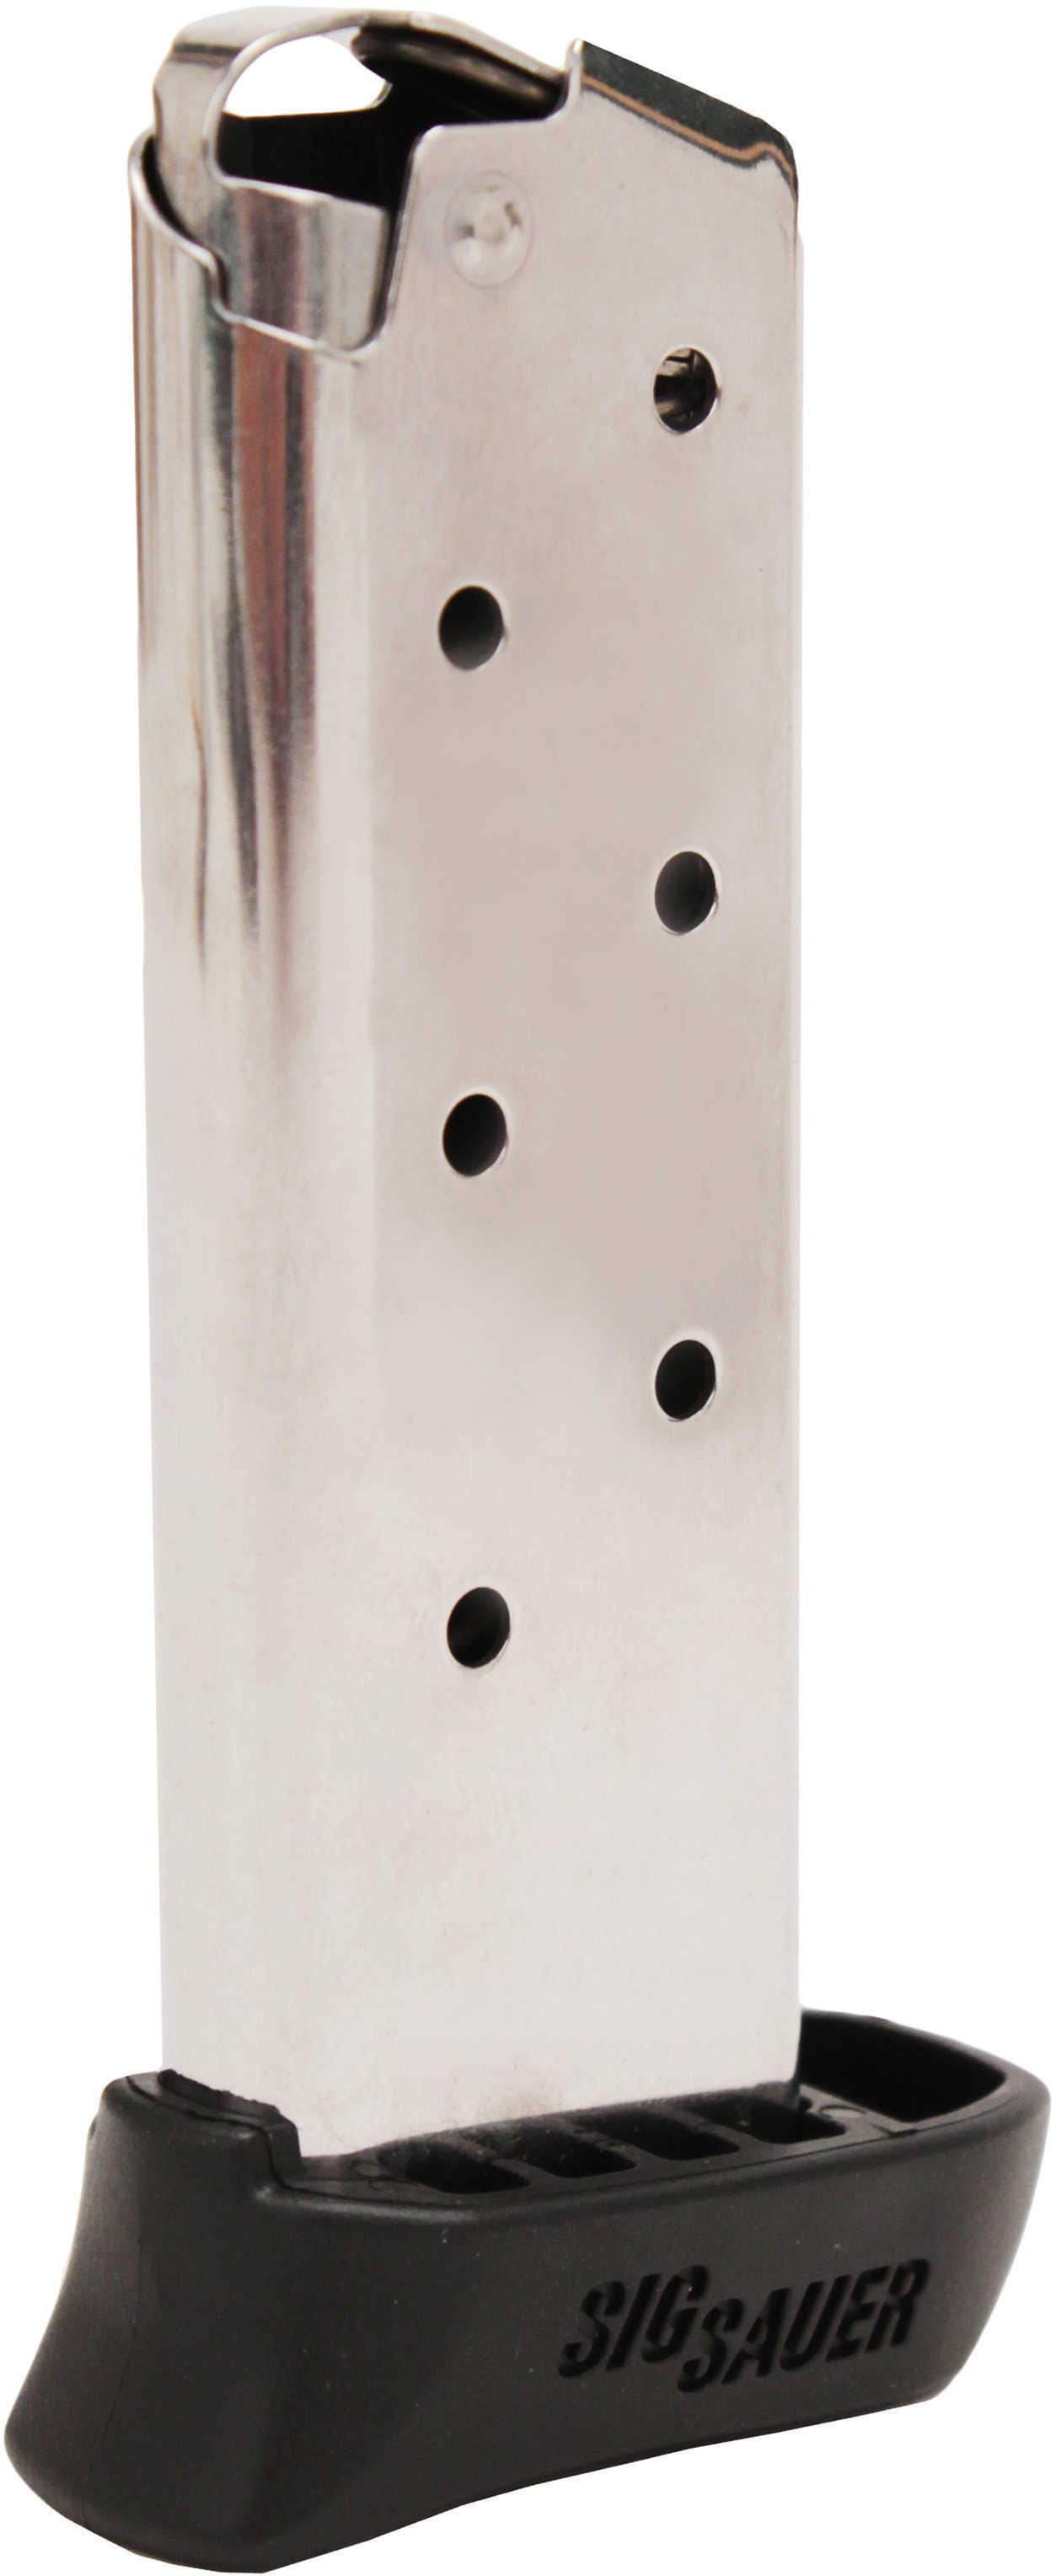 P238 380 ACP Magazine X-Grip, 7 Round Md: Mag-238-380-7-X